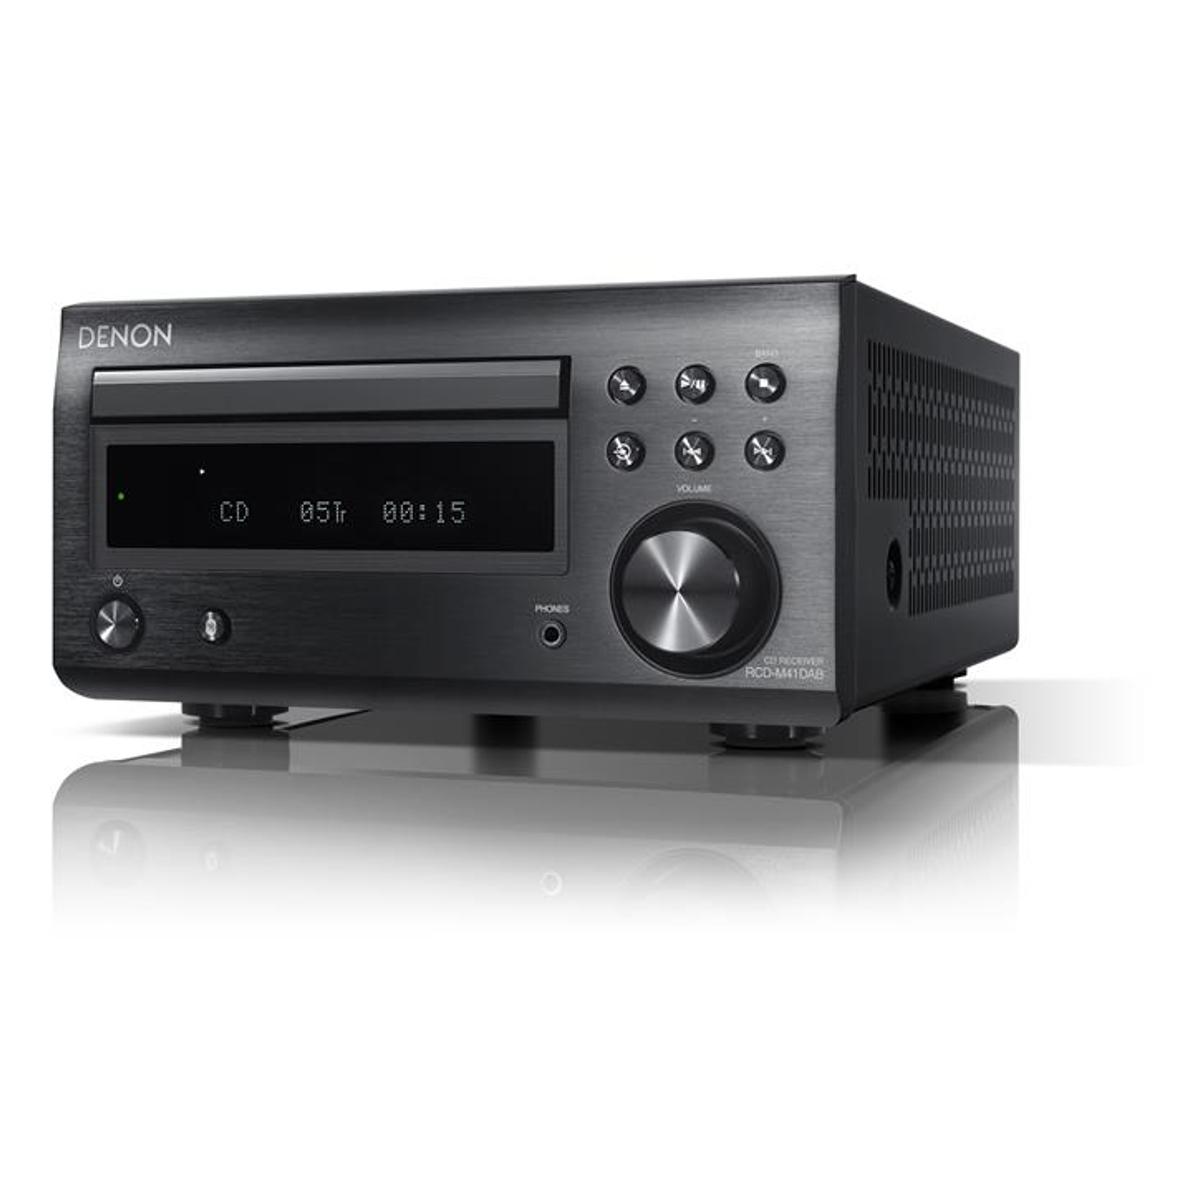 Denon RCD-M41DAB Bluetooth/CD/DAB+ 30w What Hifi Award Winner Micro Hifi - £184 using code @ Hughes